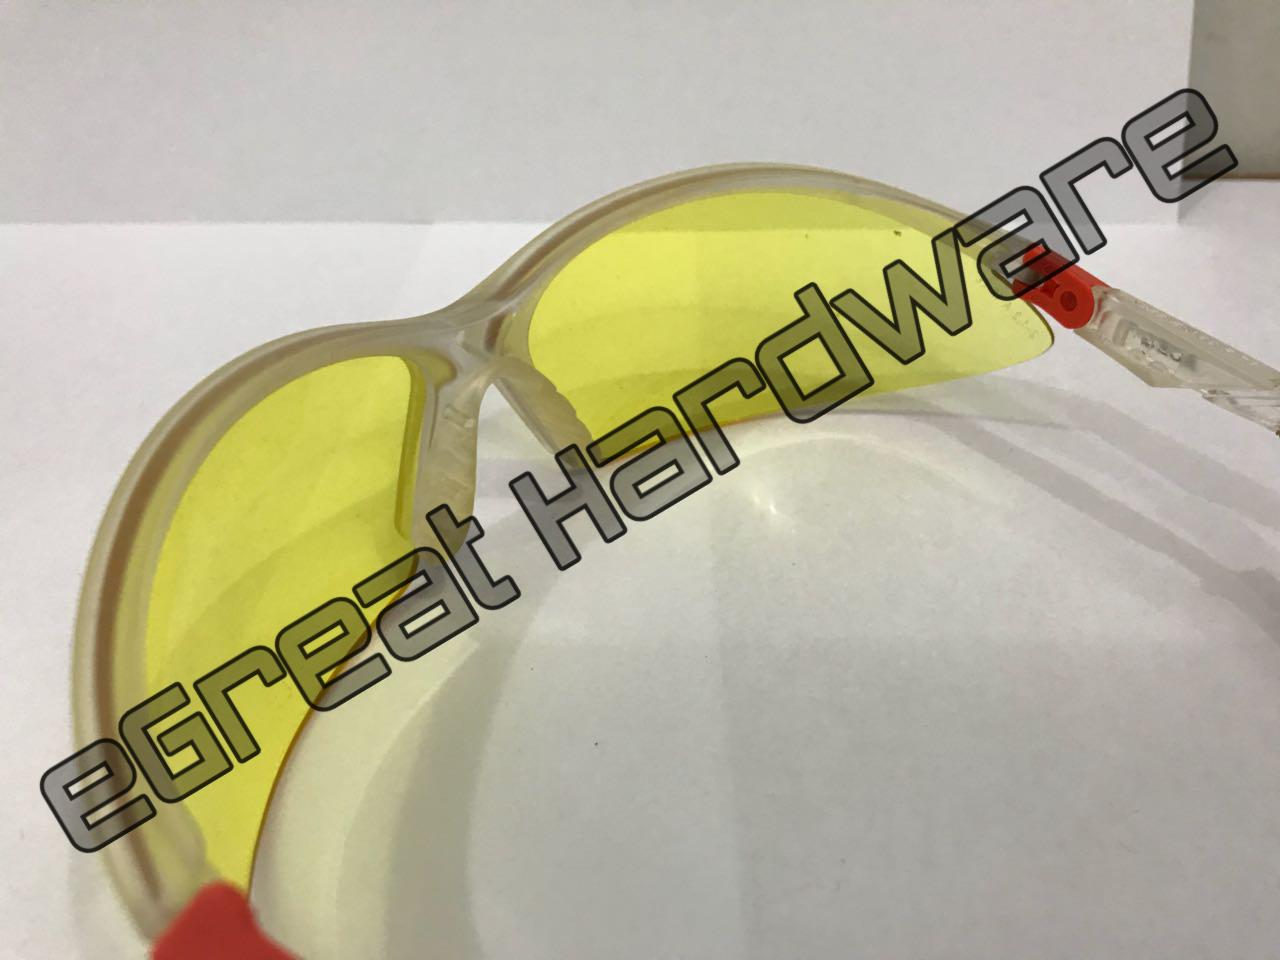 Fitur Kacamata Night View Aces A38885 Uv Protection Kuning Vision Aimons Glasses Kaca Mata Anti Silau Sport Version 3